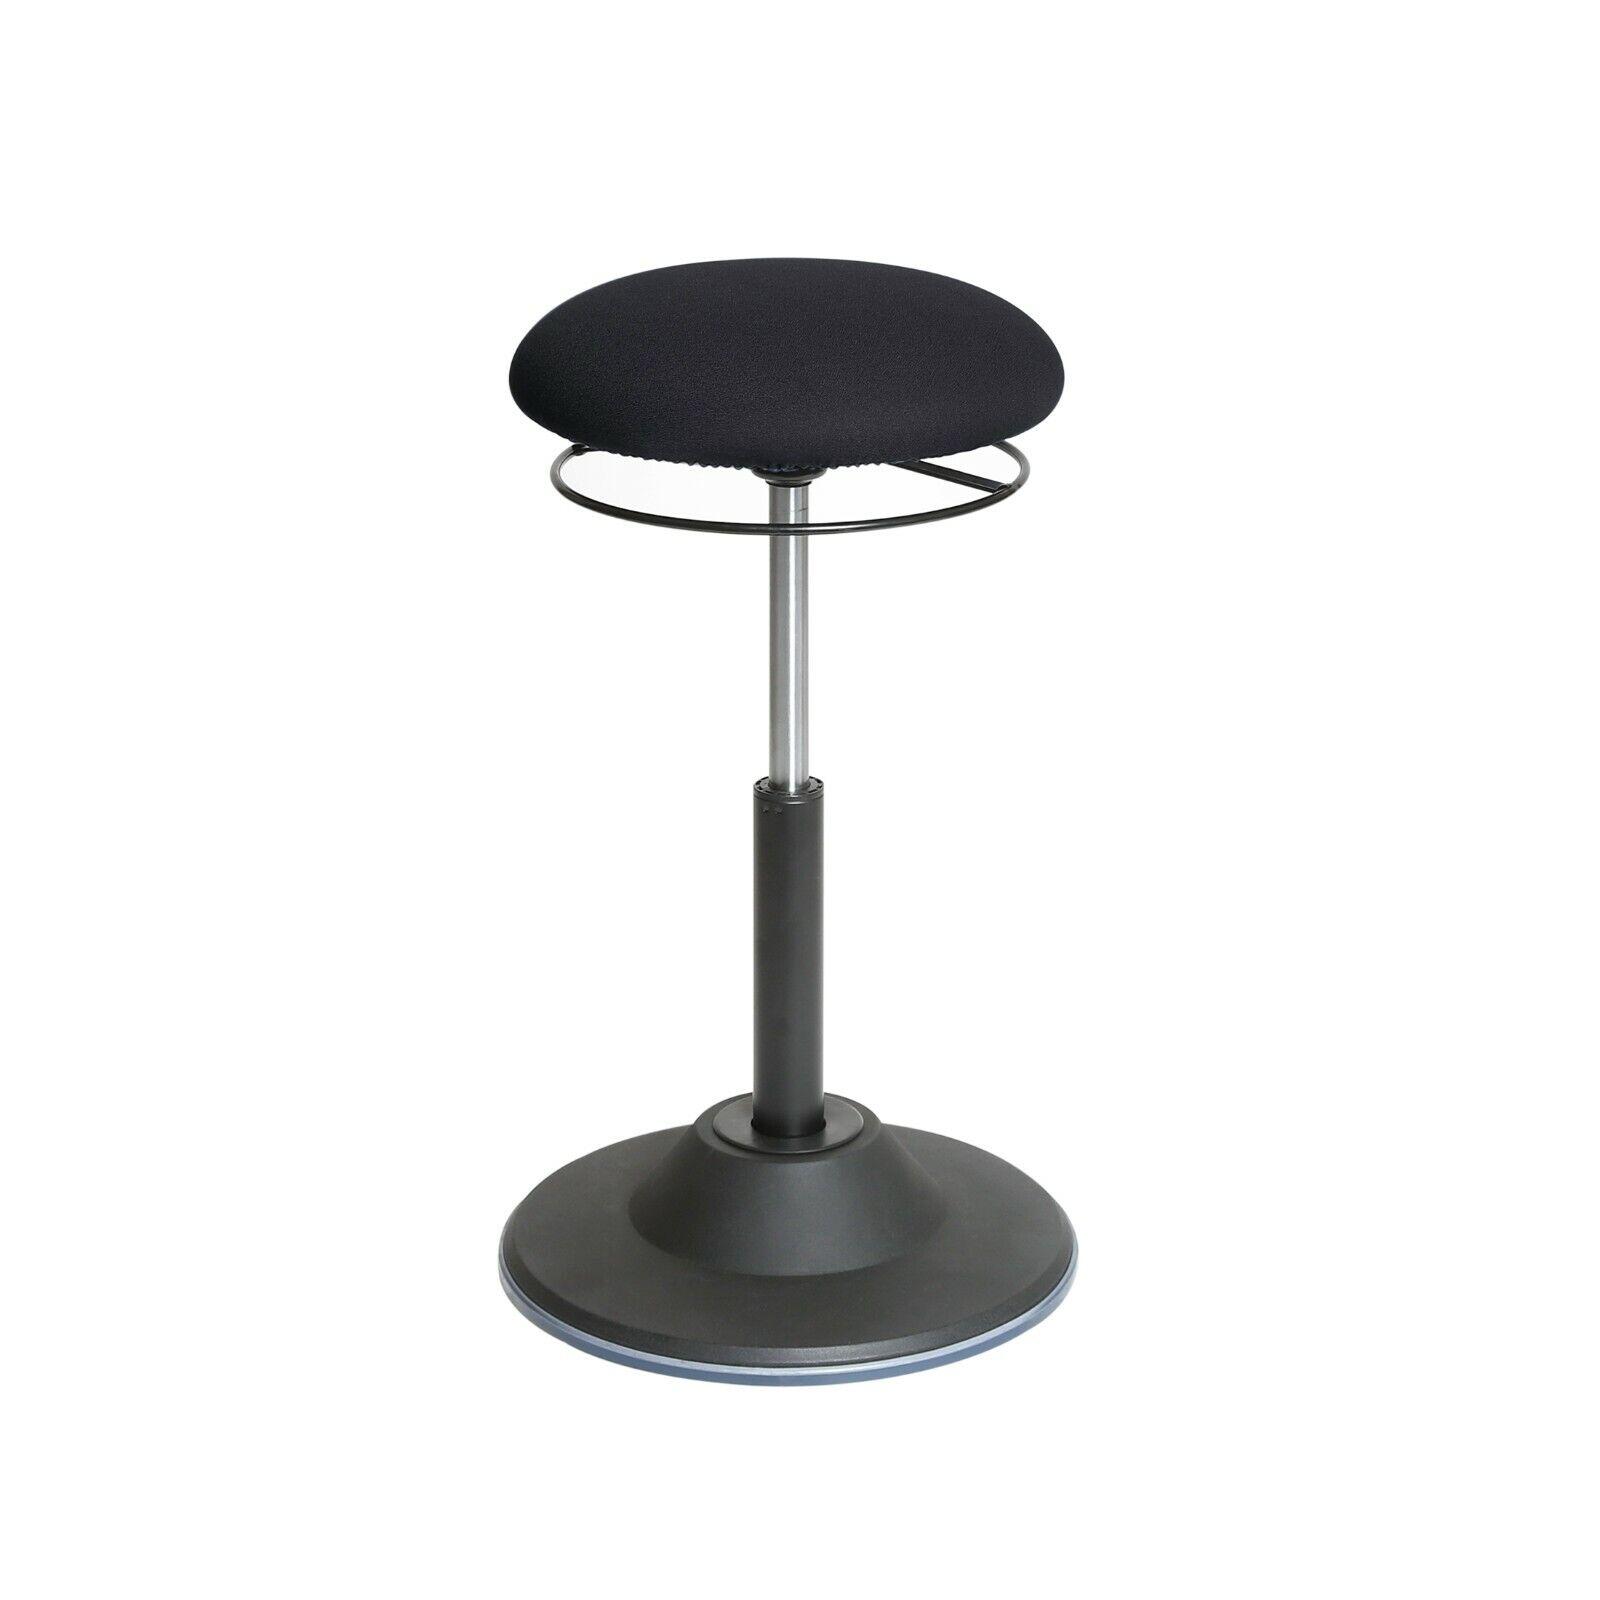 360 SIT-STAND ADJUSTABLE ERGONOMIC ACTIVE BALANCE STOOL Business & Industrial